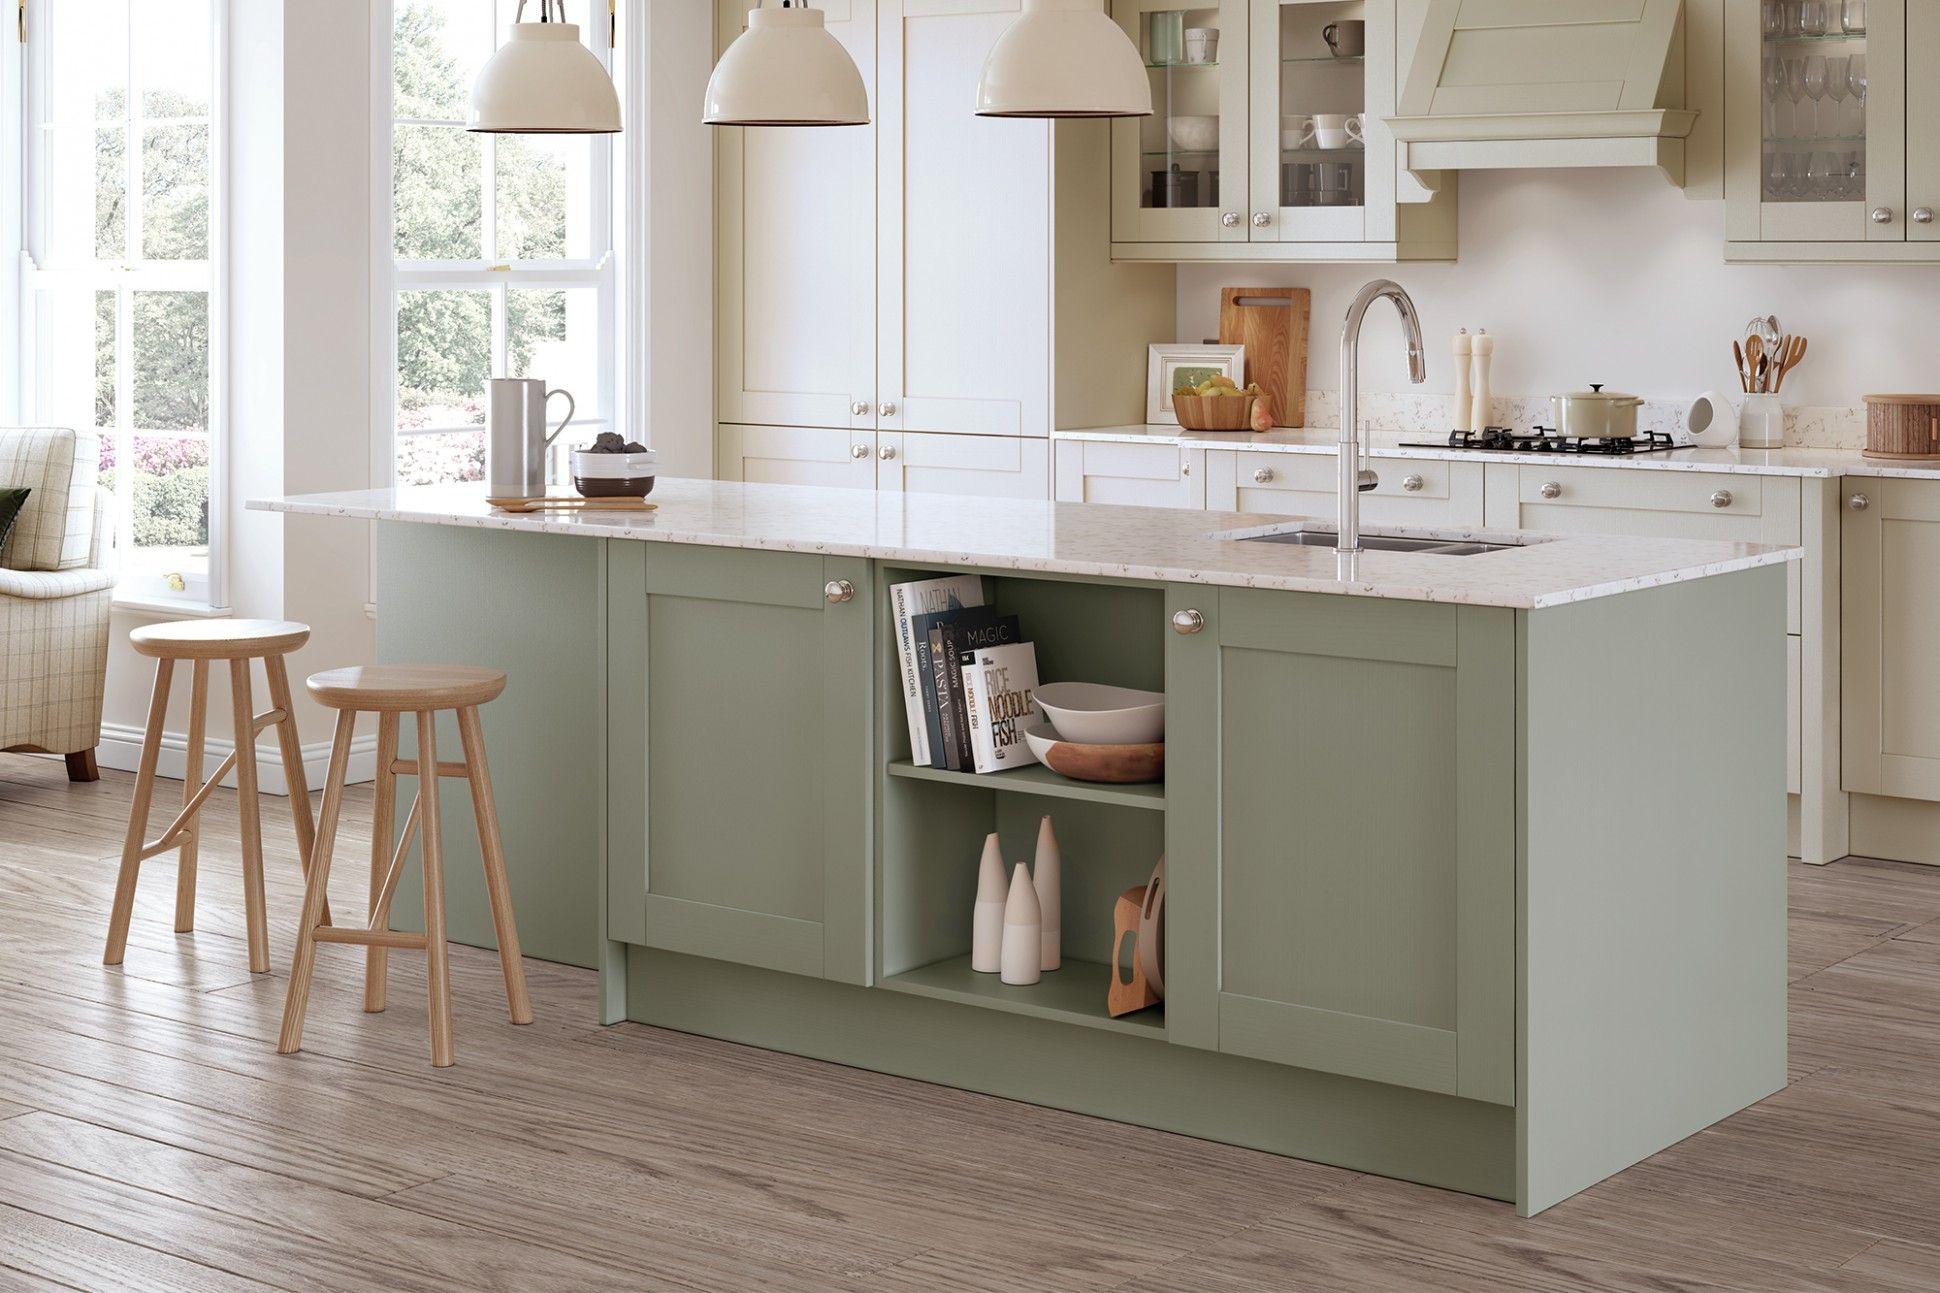 Sage Green Shaker Kitchen Cabinets Sage Green Kitchen Cheap Kitchen Units Green Kitchen Cabinets